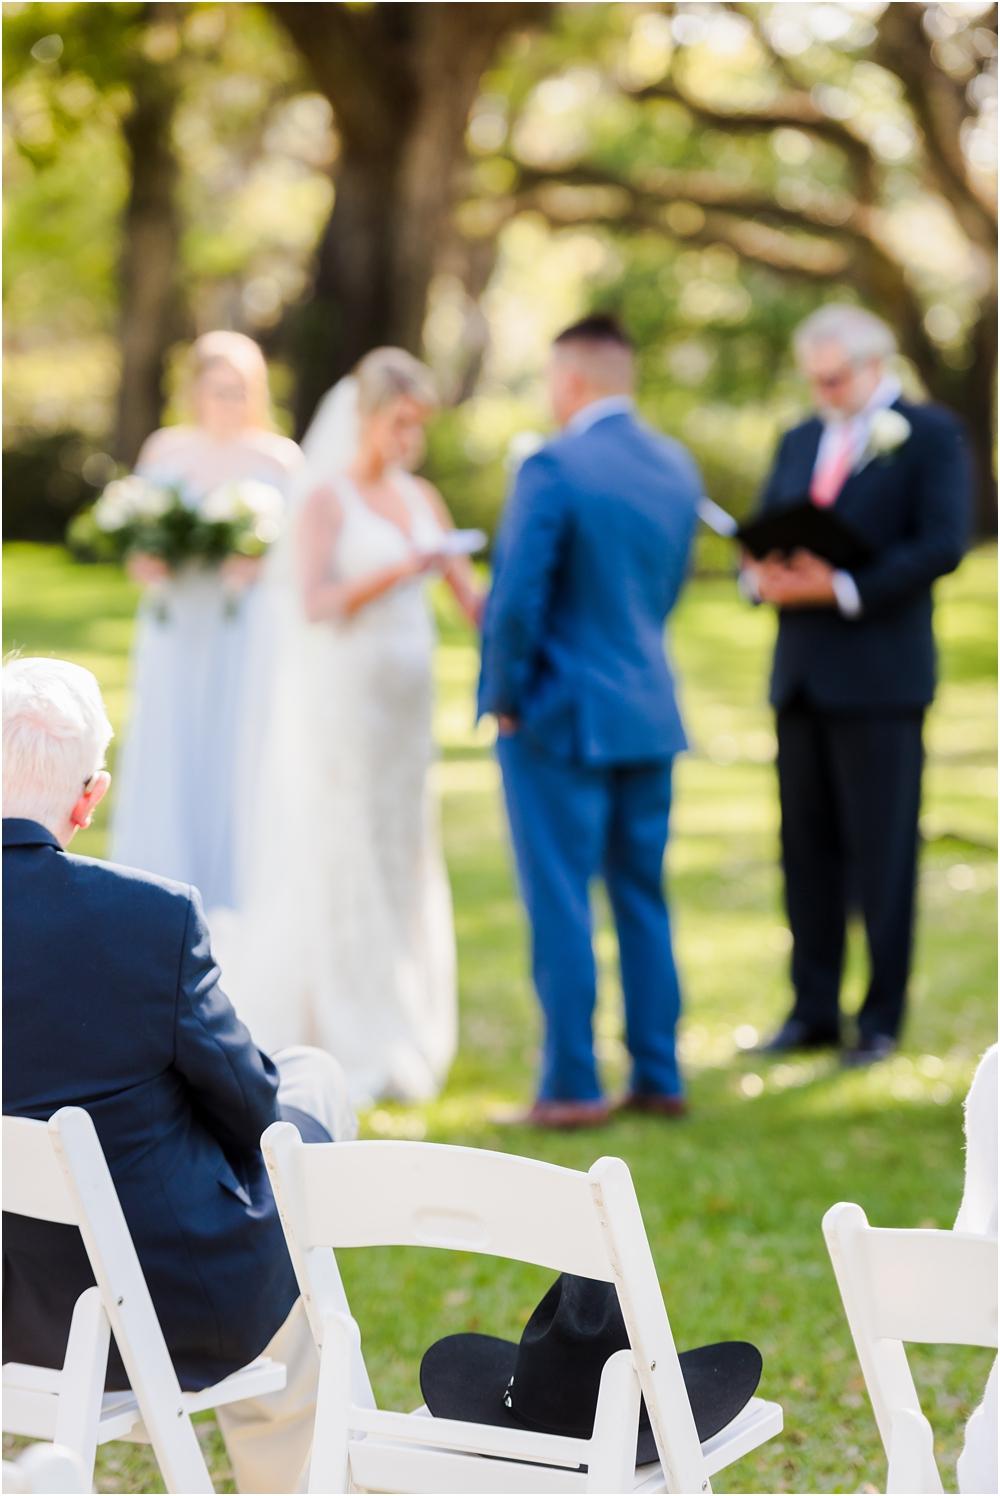 eden-gardens-walton-county-florida-wedding-kiersten-stevenson-photography-57.jpg